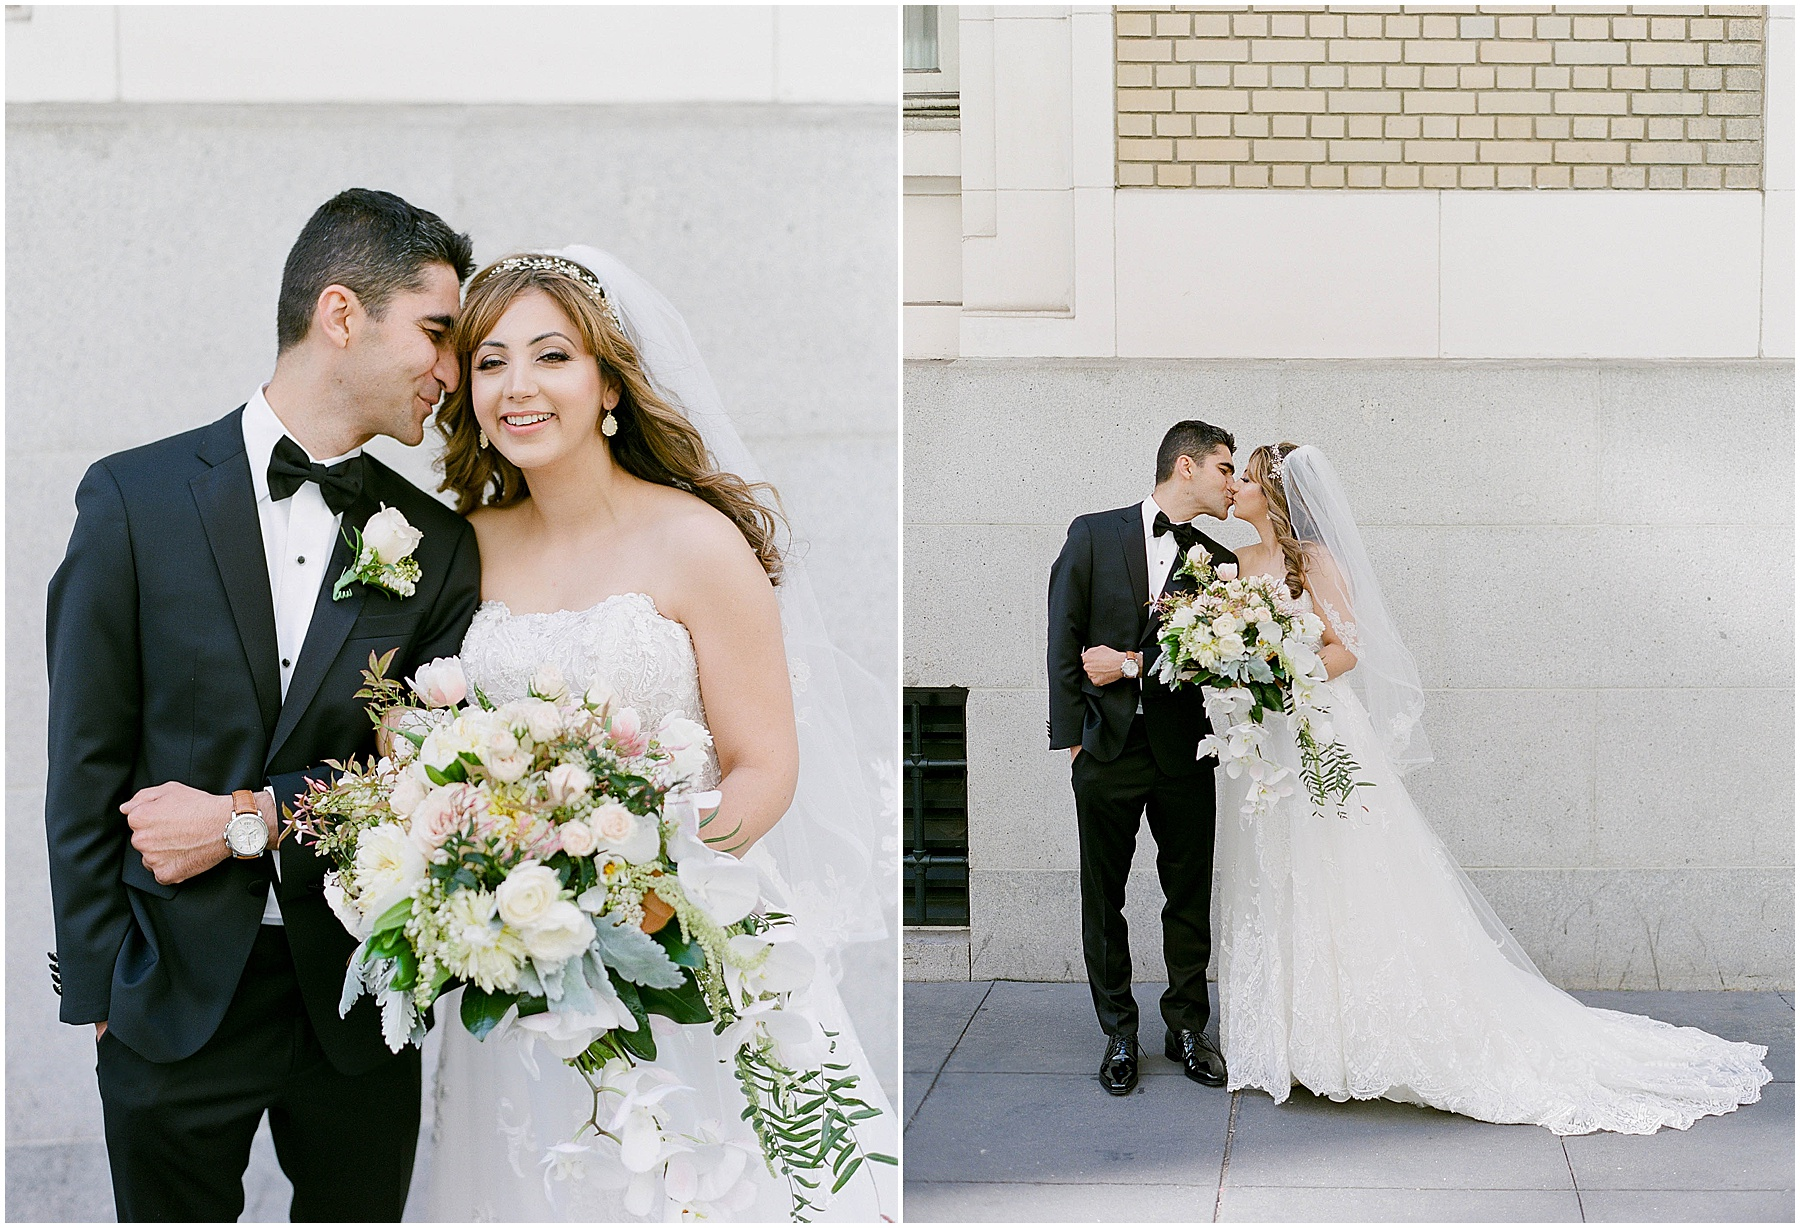 San-Francisco-Palace-Hotel-wedding-kristine-herman-photography23.jpg